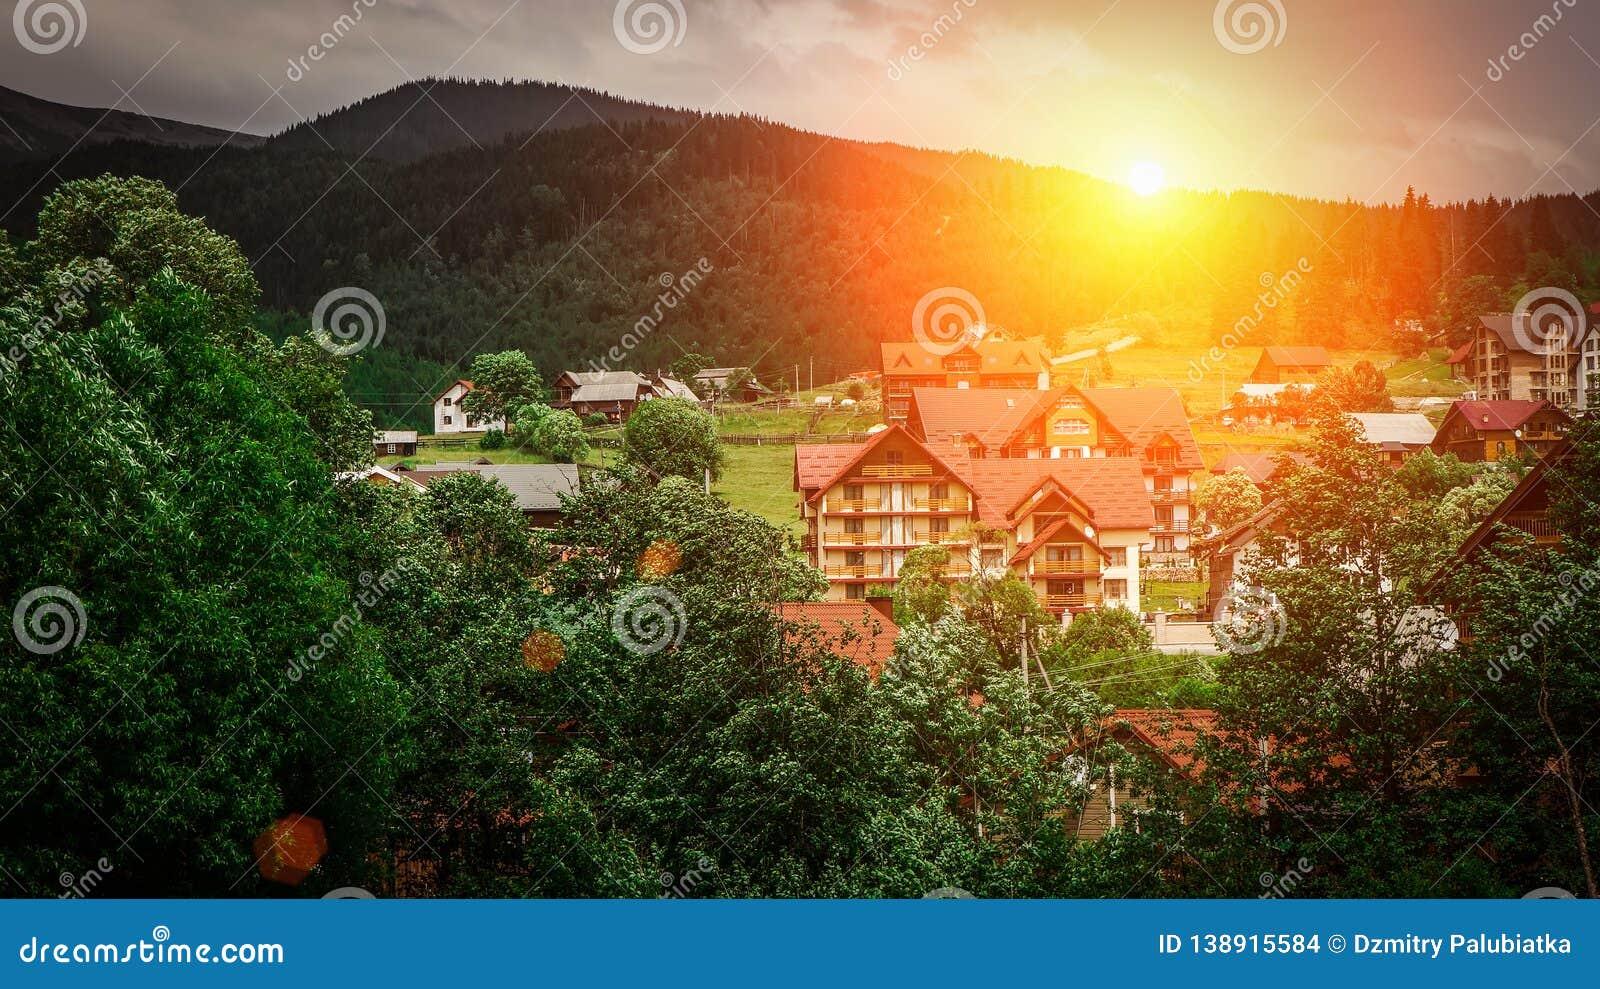 The sunset or sunrise , beautiful landscape, rice fields autumn near the village in the mountains, ukrainian carpathian mountains